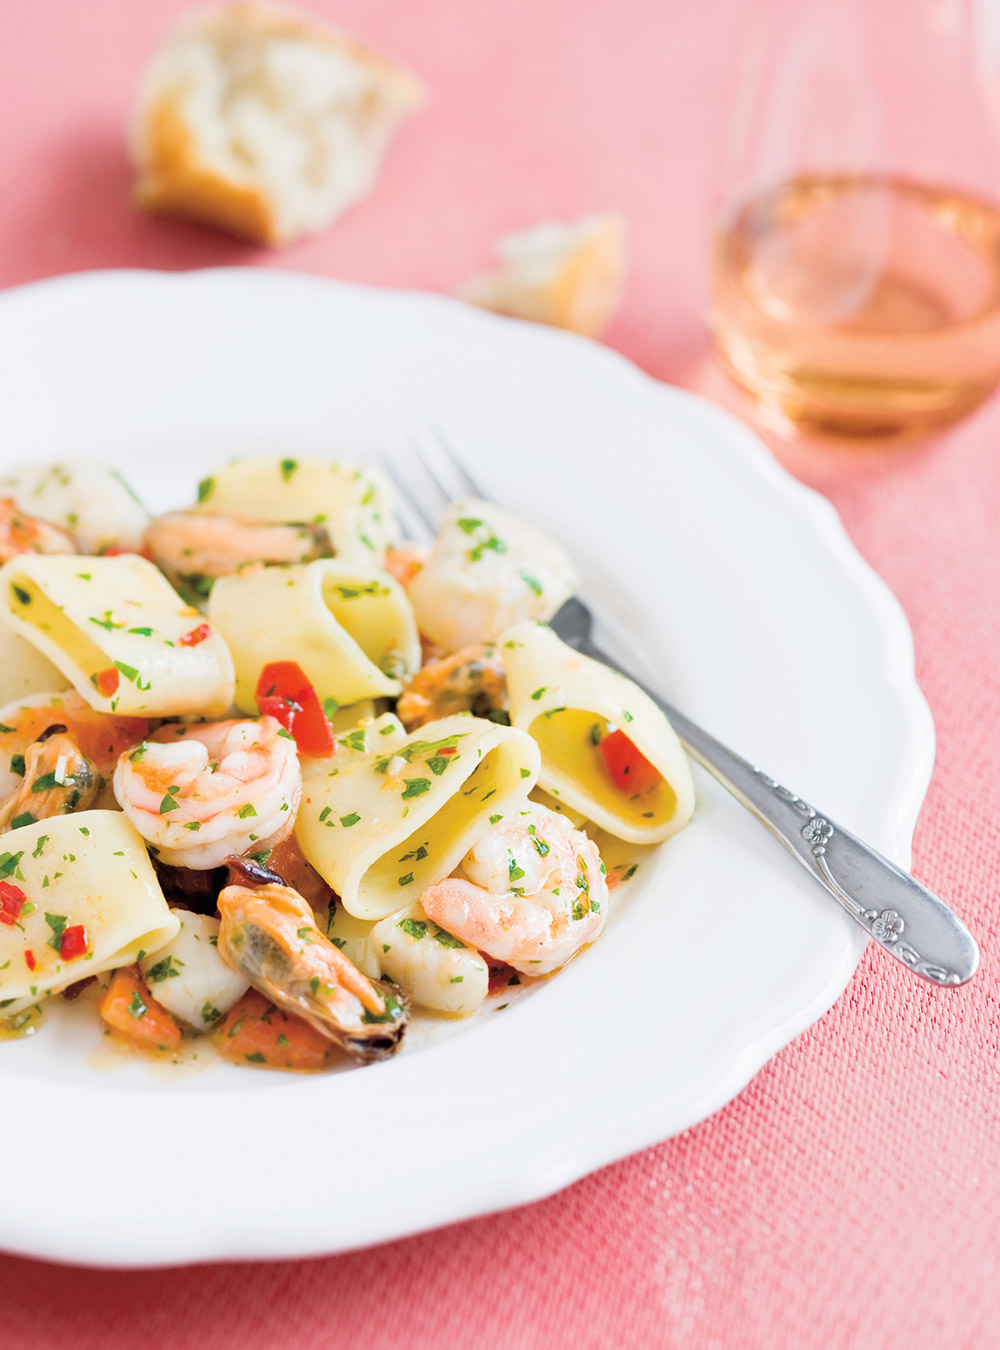 pates italiennes aux fruits de mer mezzi paccheri ai frutti di mare